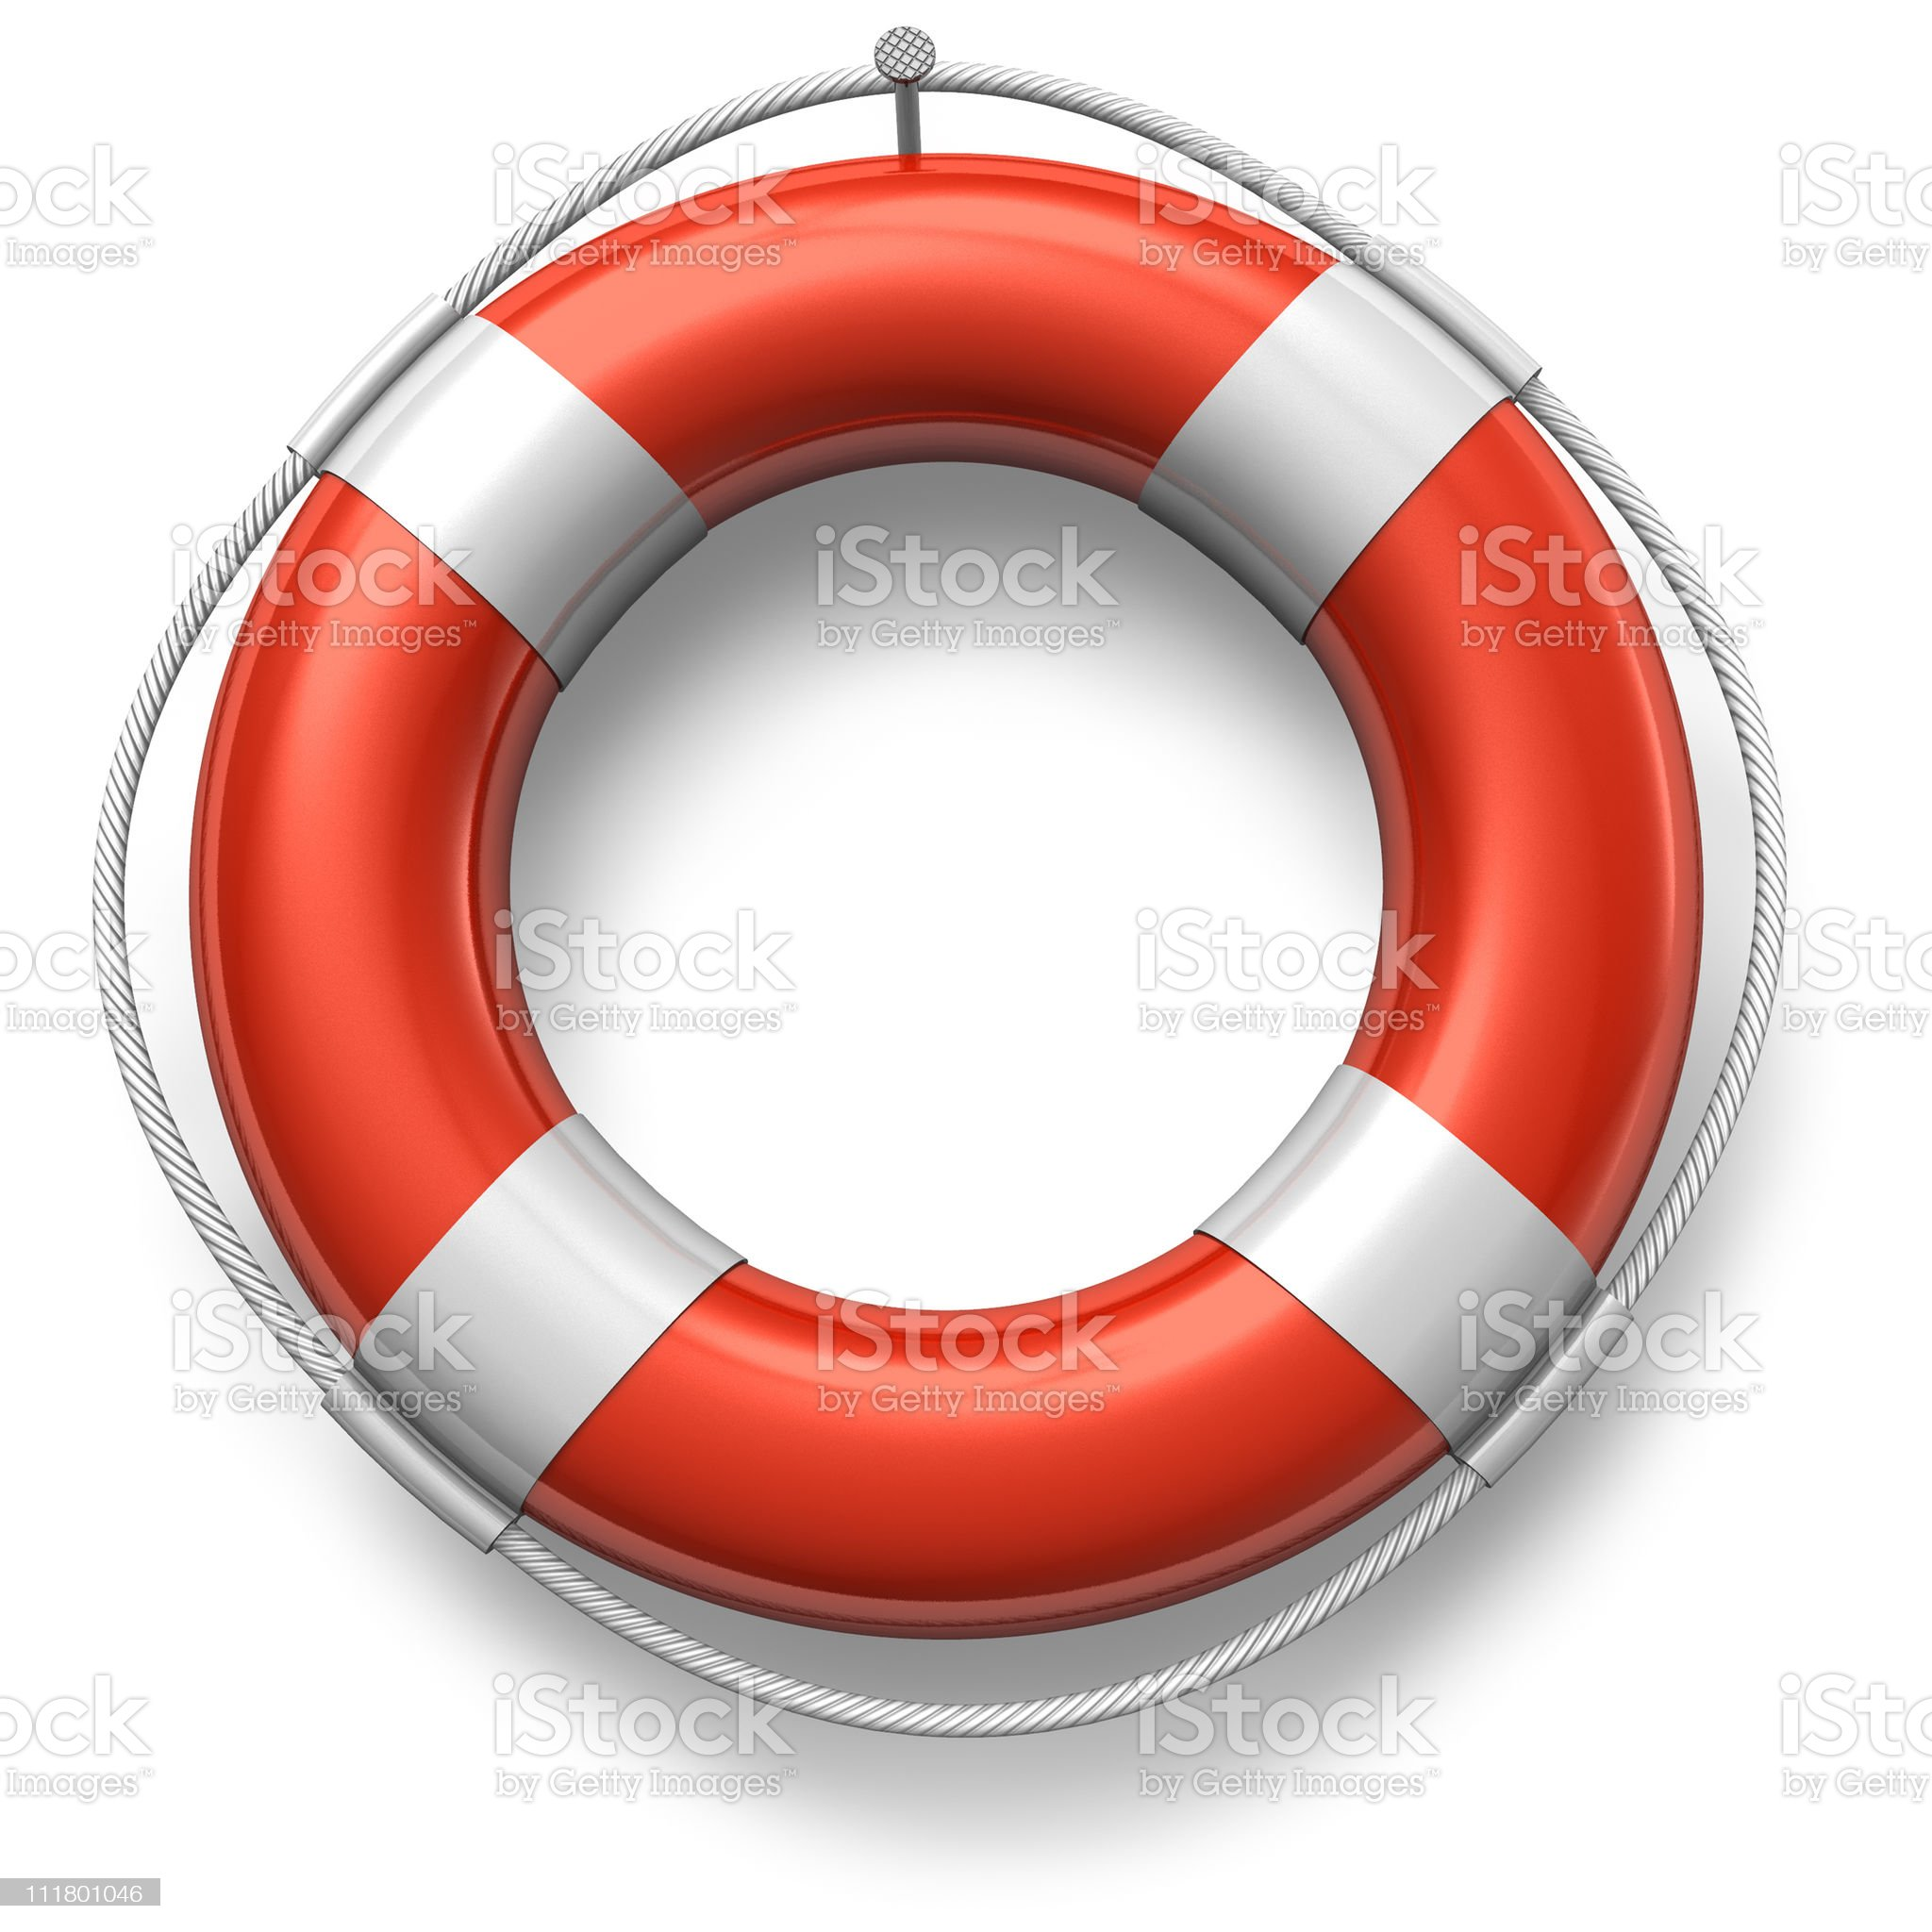 Red lifesaver royalty-free stock photo